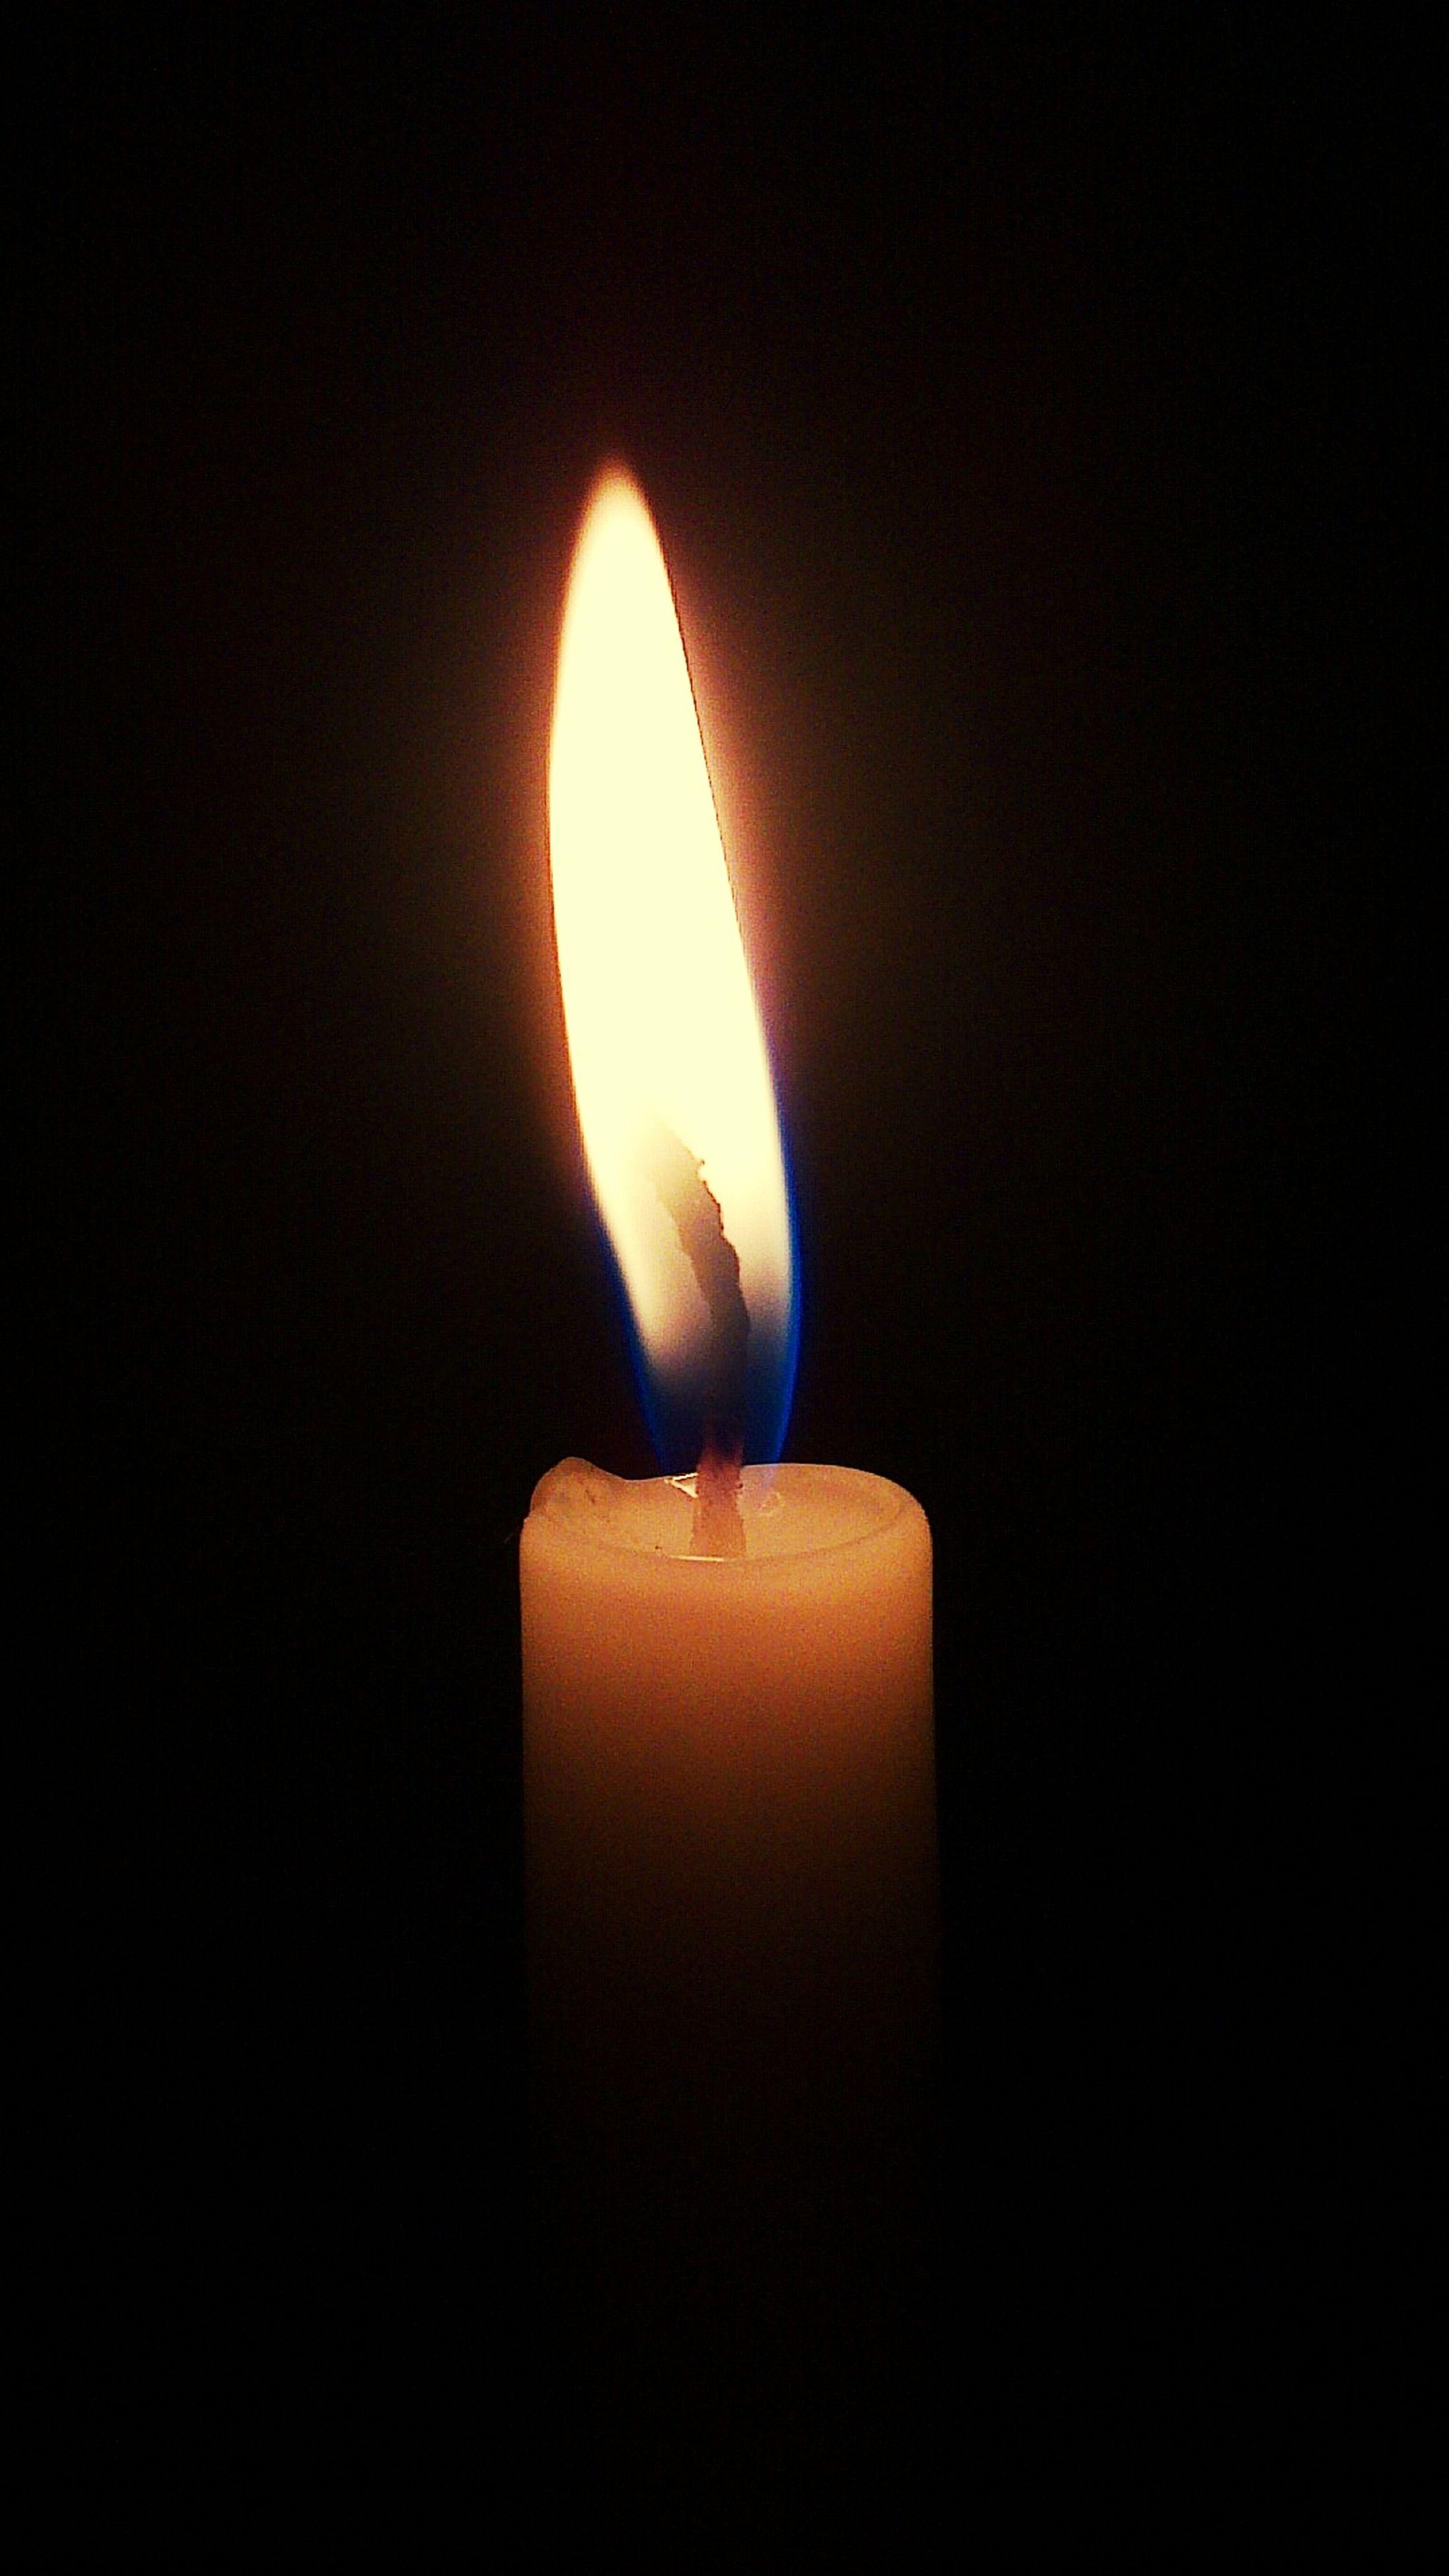 flame, burning, heat - temperature, fire - natural phenomenon, candle, glowing, illuminated, indoors, lit, close-up, dark, fire, candlelight, darkroom, copy space, black background, studio shot, light - natural phenomenon, night, heat